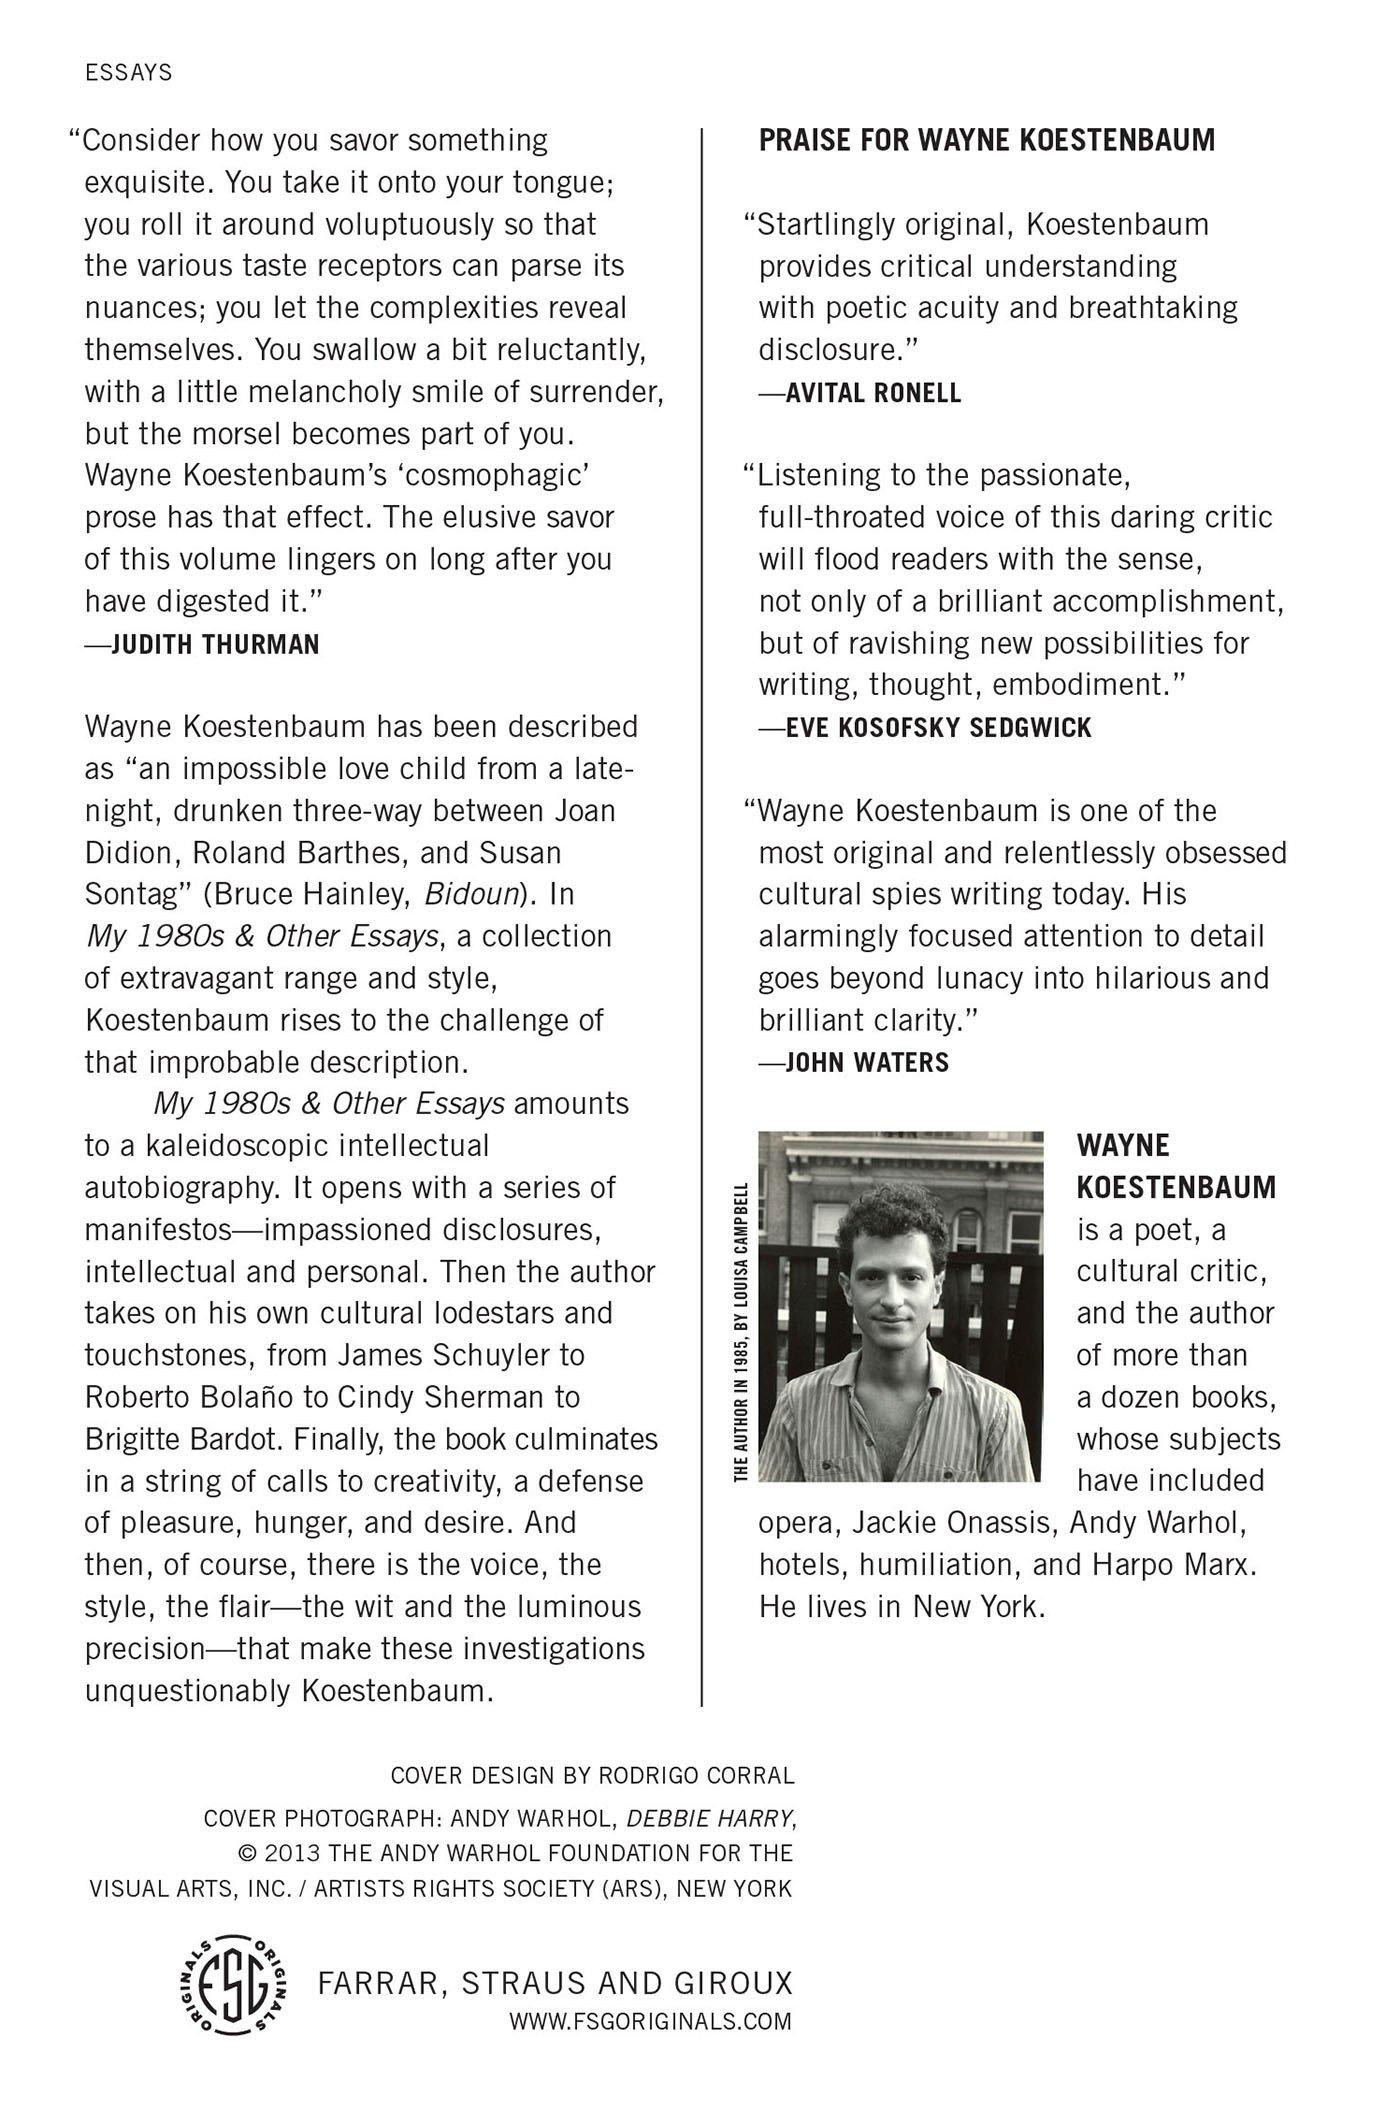 my s and other essays wayne koestenbaum  my 1980s and other essays wayne koestenbaum 9780374533779 com books